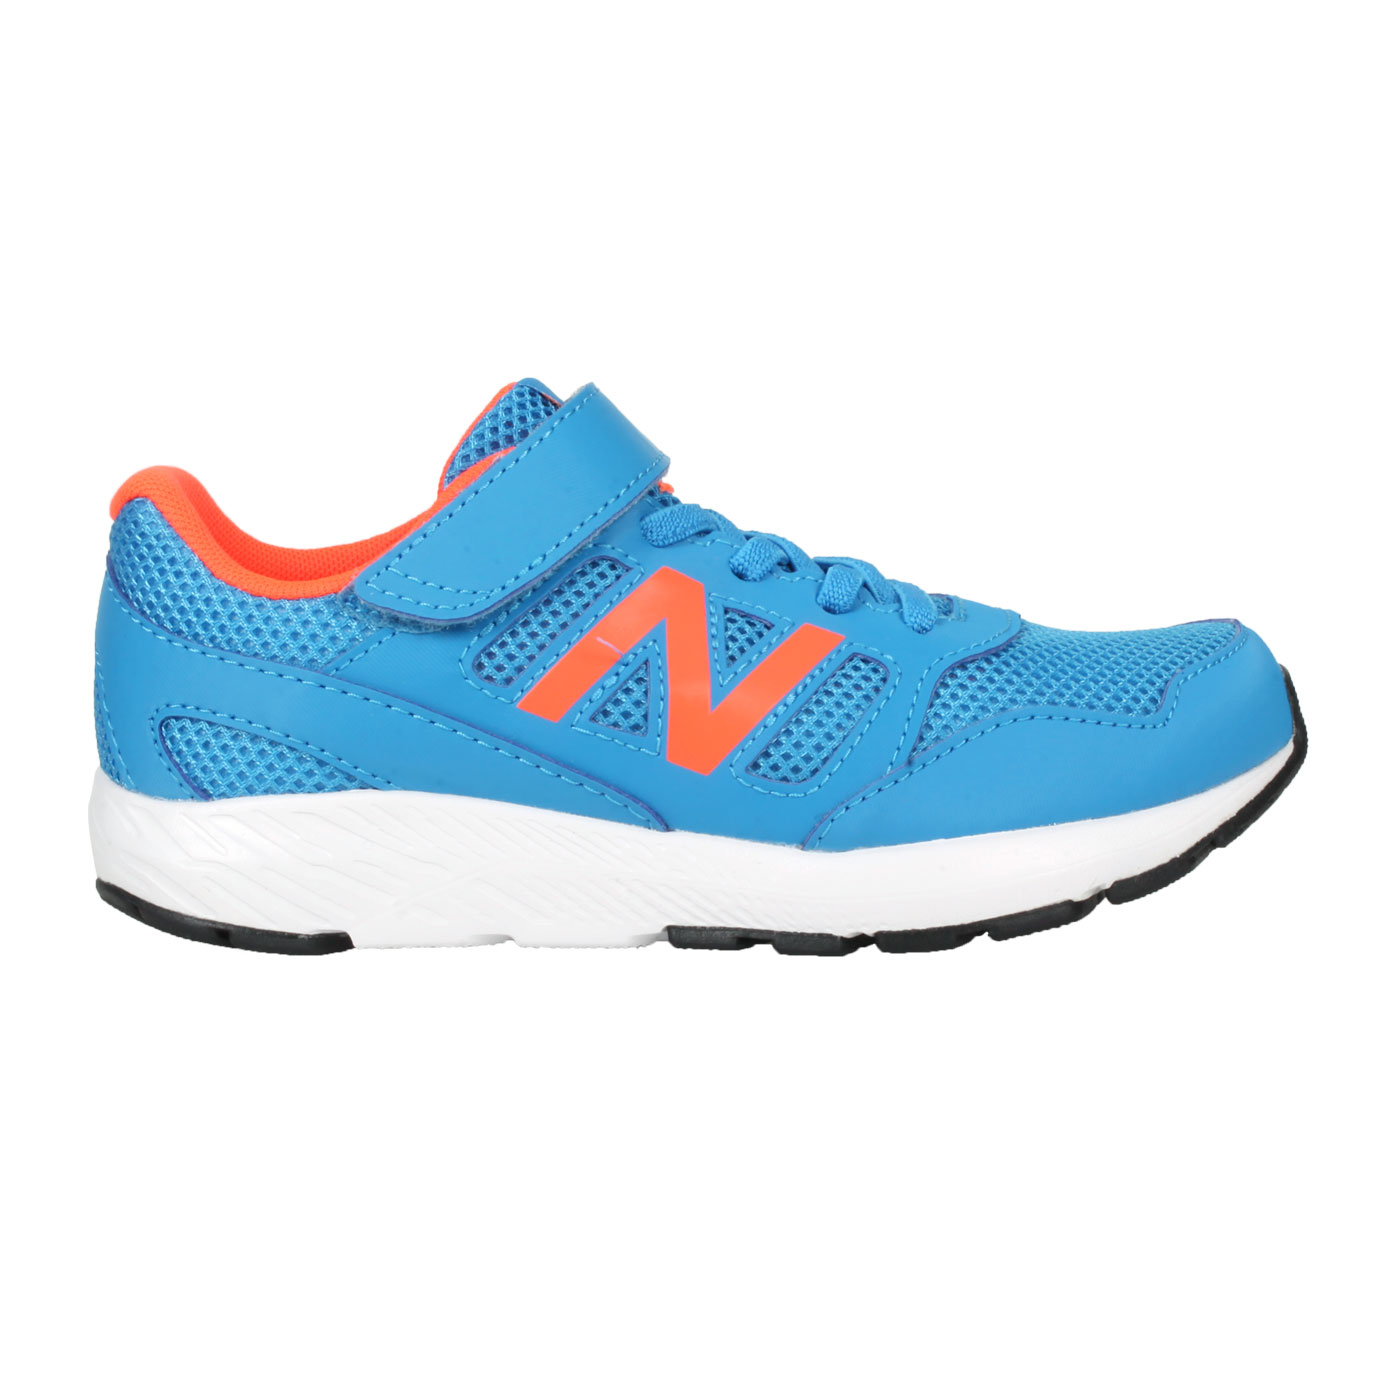 NEW BALANCE 中童休閒運動鞋-WIDE YT570CRS - 寶藍螢光橘